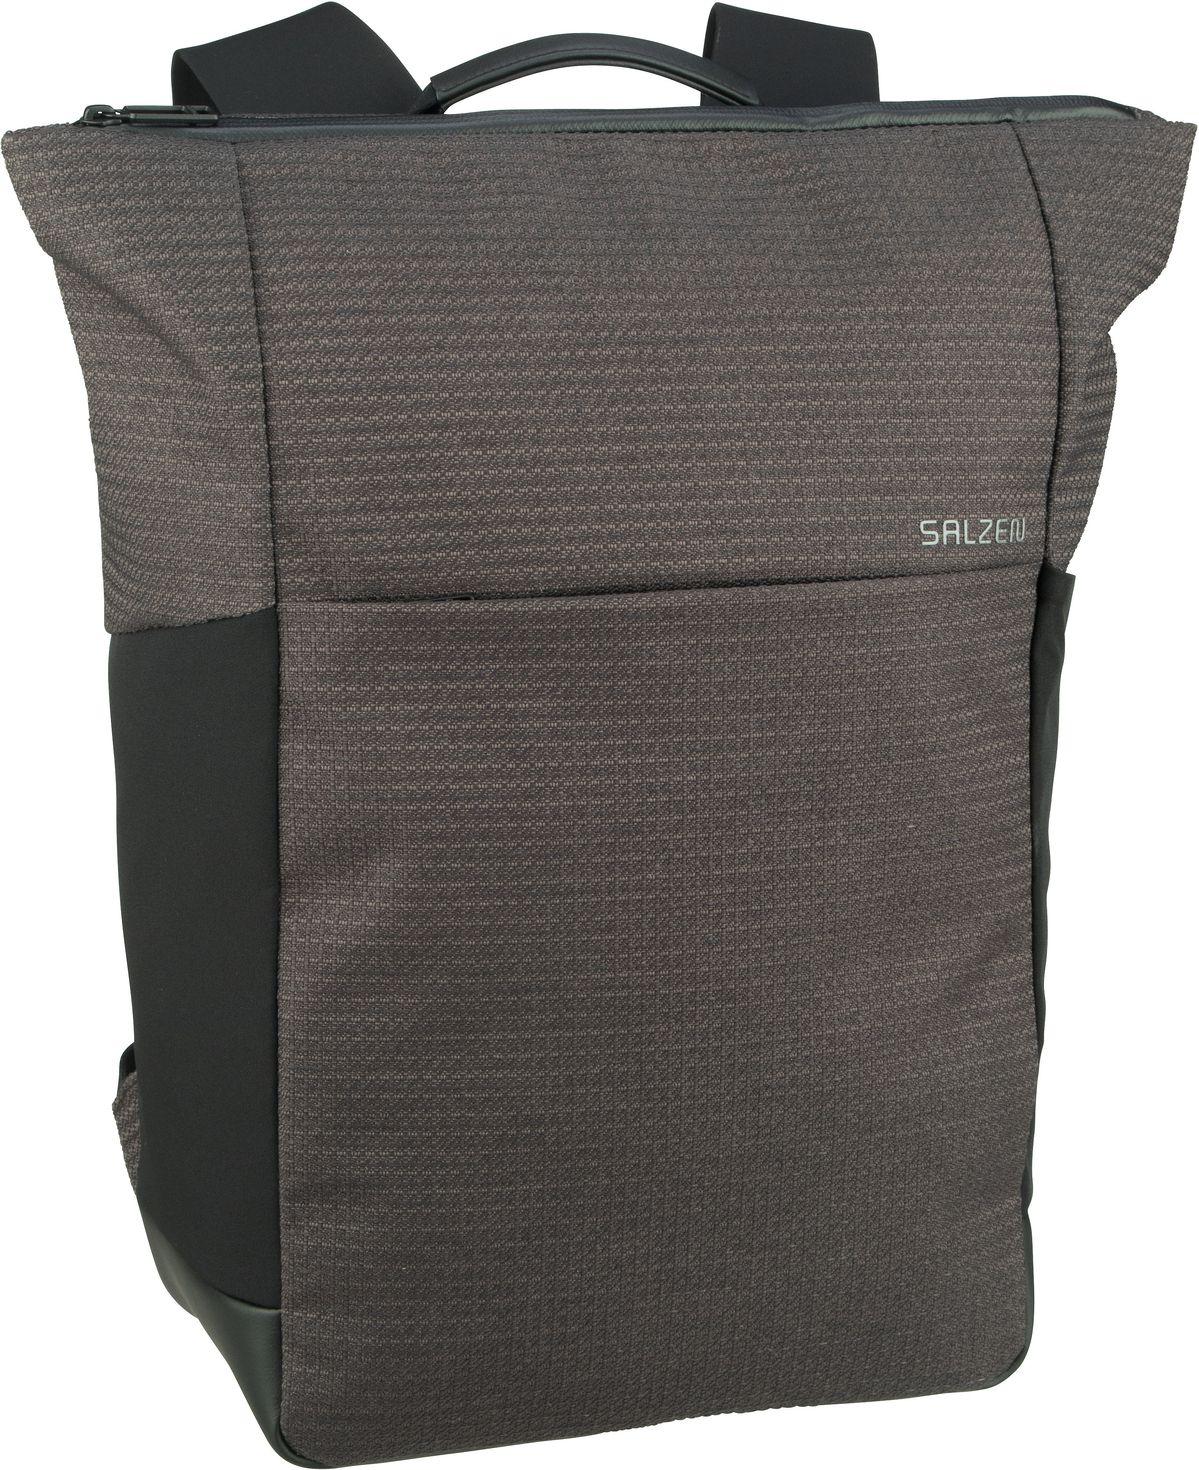 Rucksack / Daypack Vertiplorer Fabric Ash Grey (21 Liter)